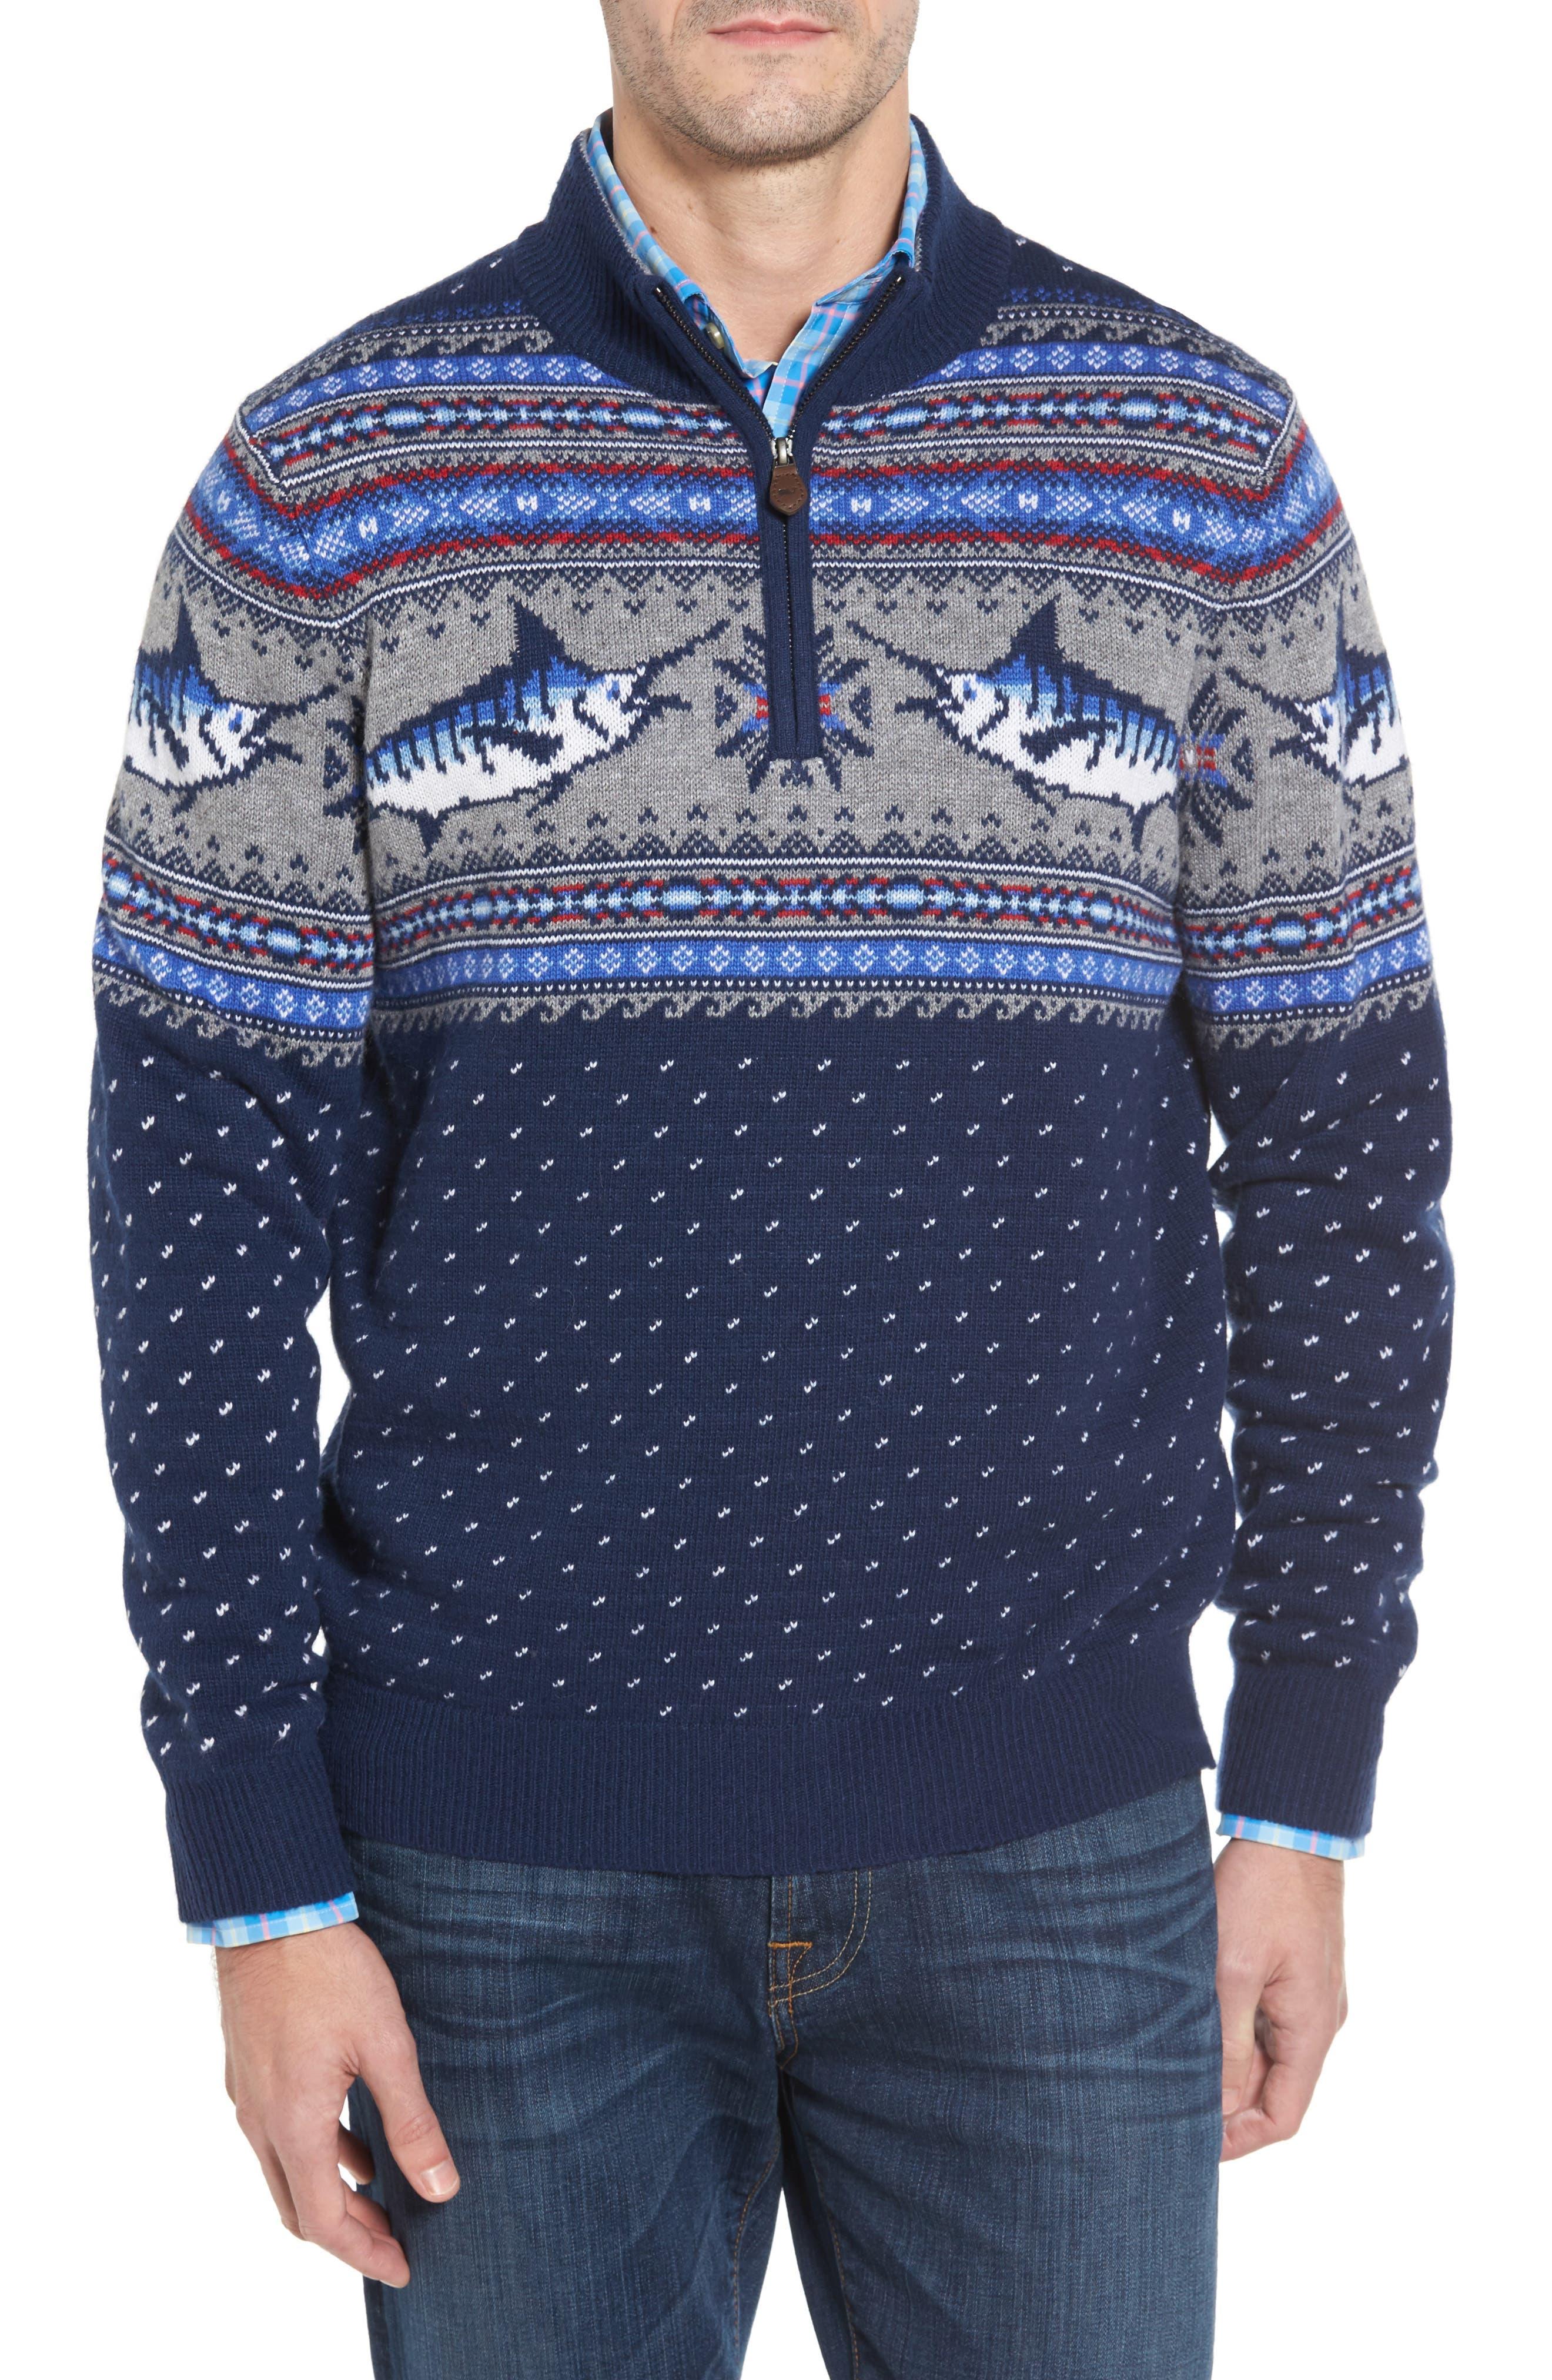 Men's Blue Wool Blend Sweaters | Nordstrom